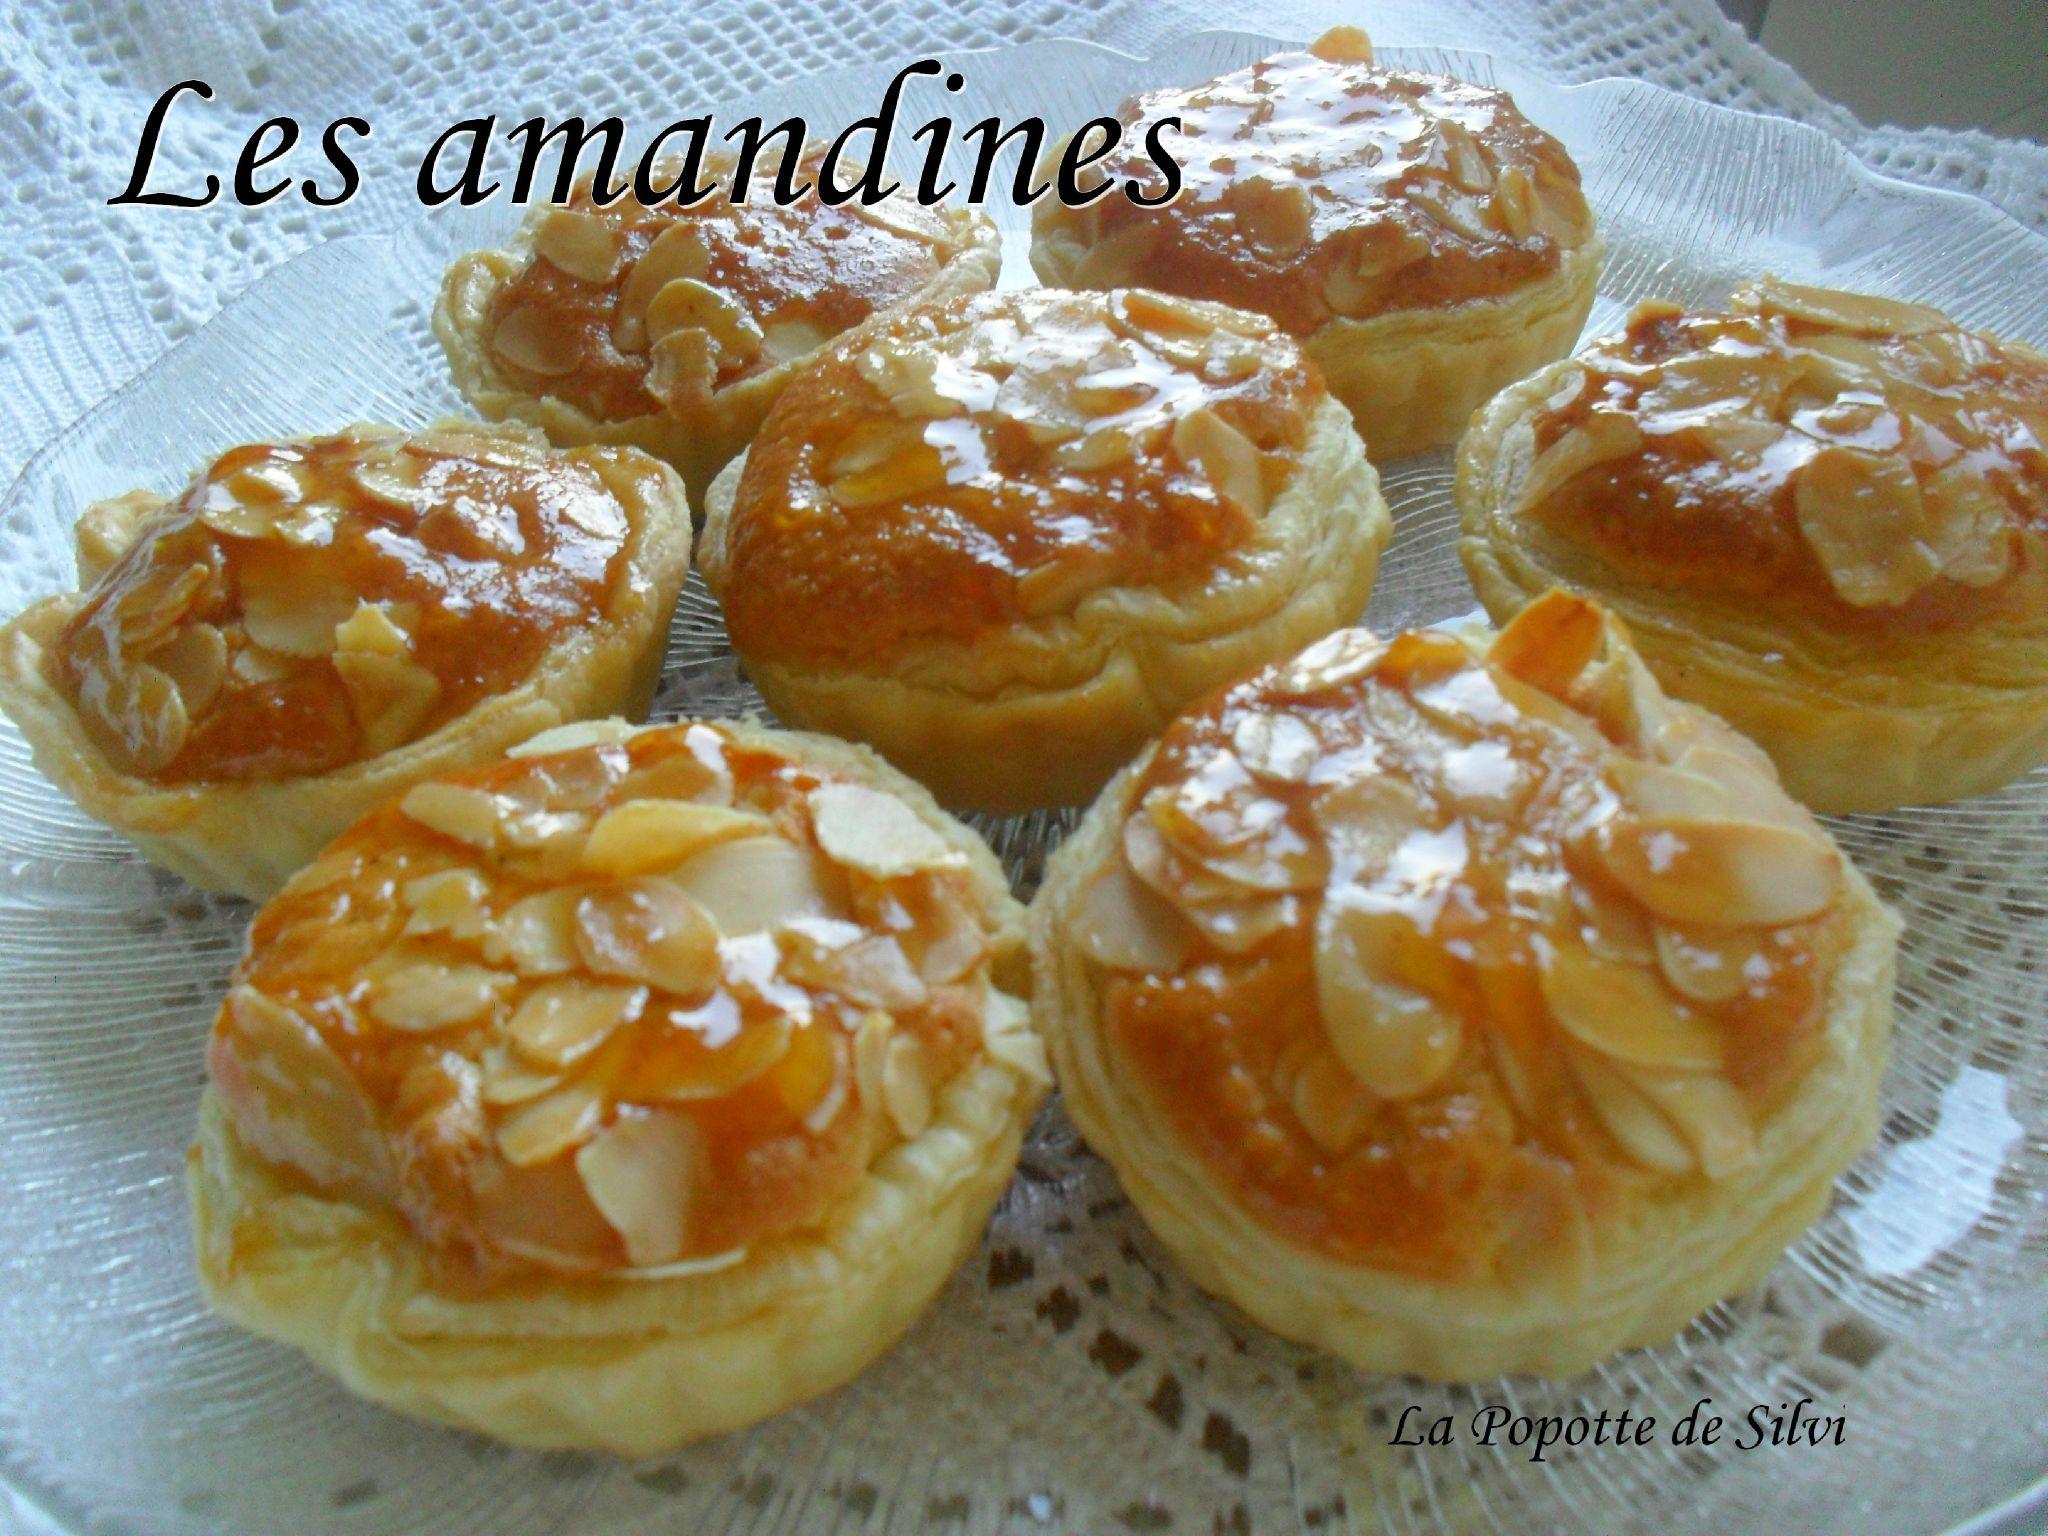 Favorit Amandines - La popotte de Silvi SH21